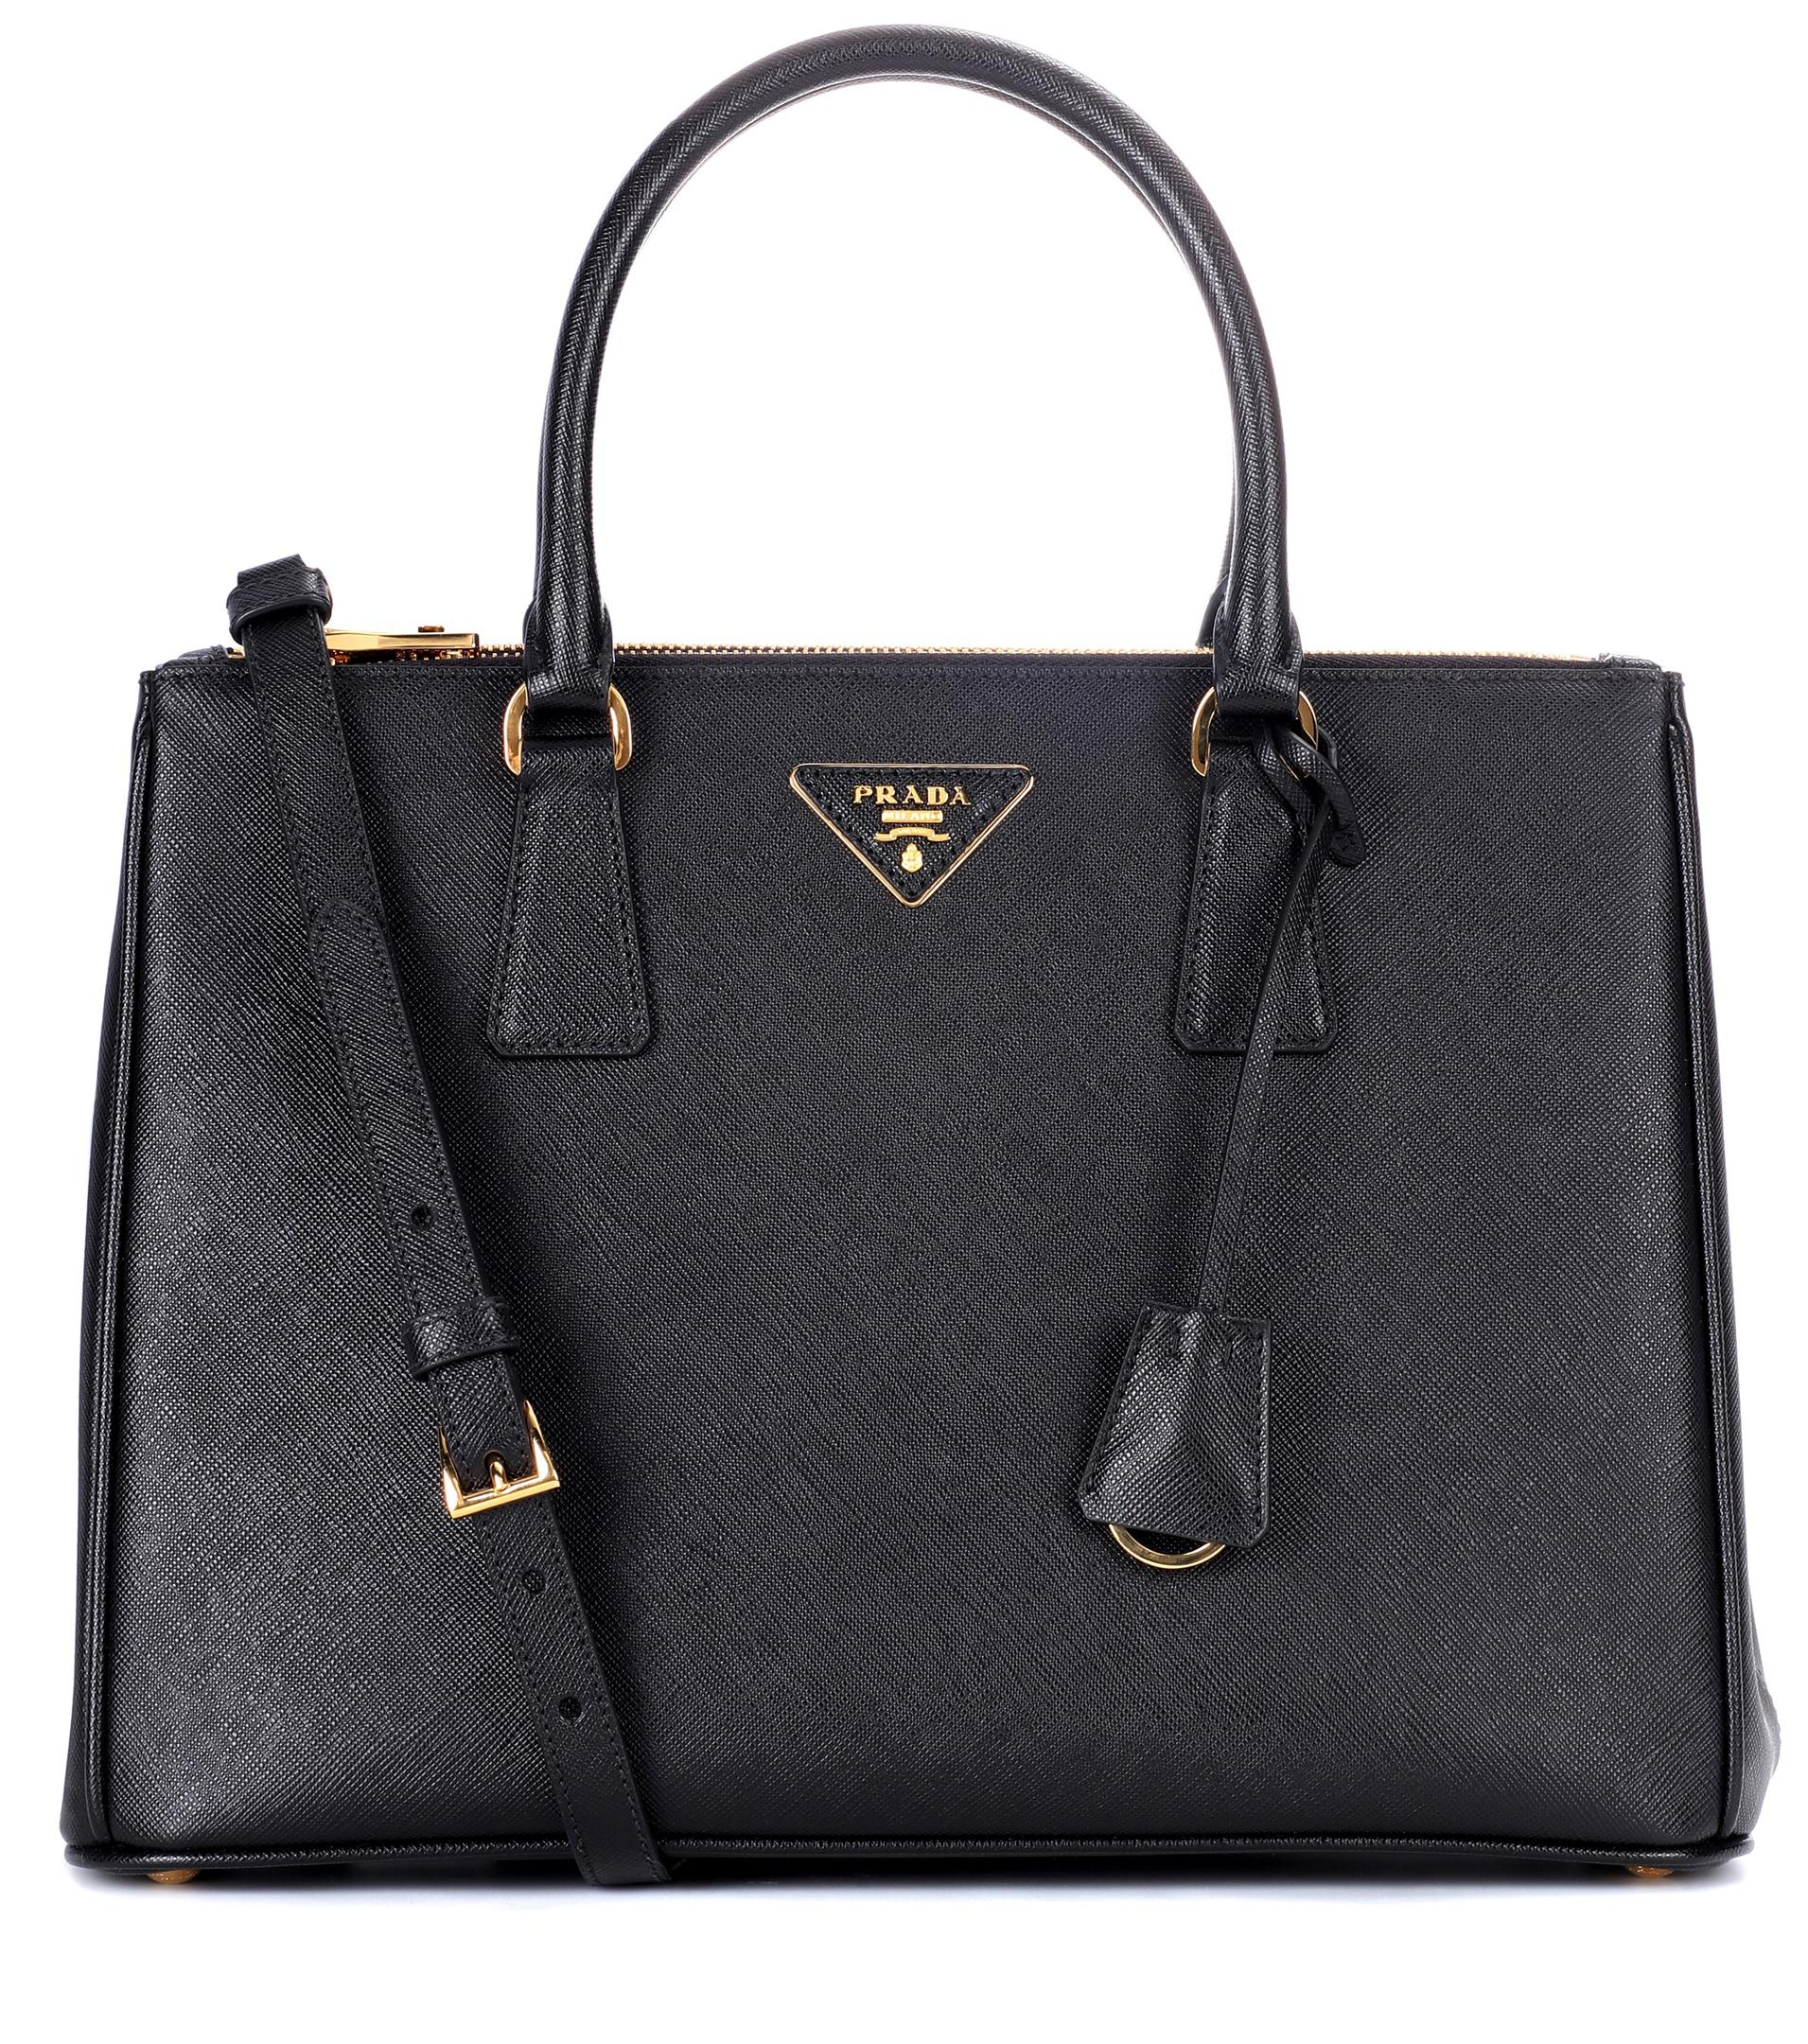 2b6f177ef165a8 Prada Galleria Saffiano Leather Tote in Black - Lyst